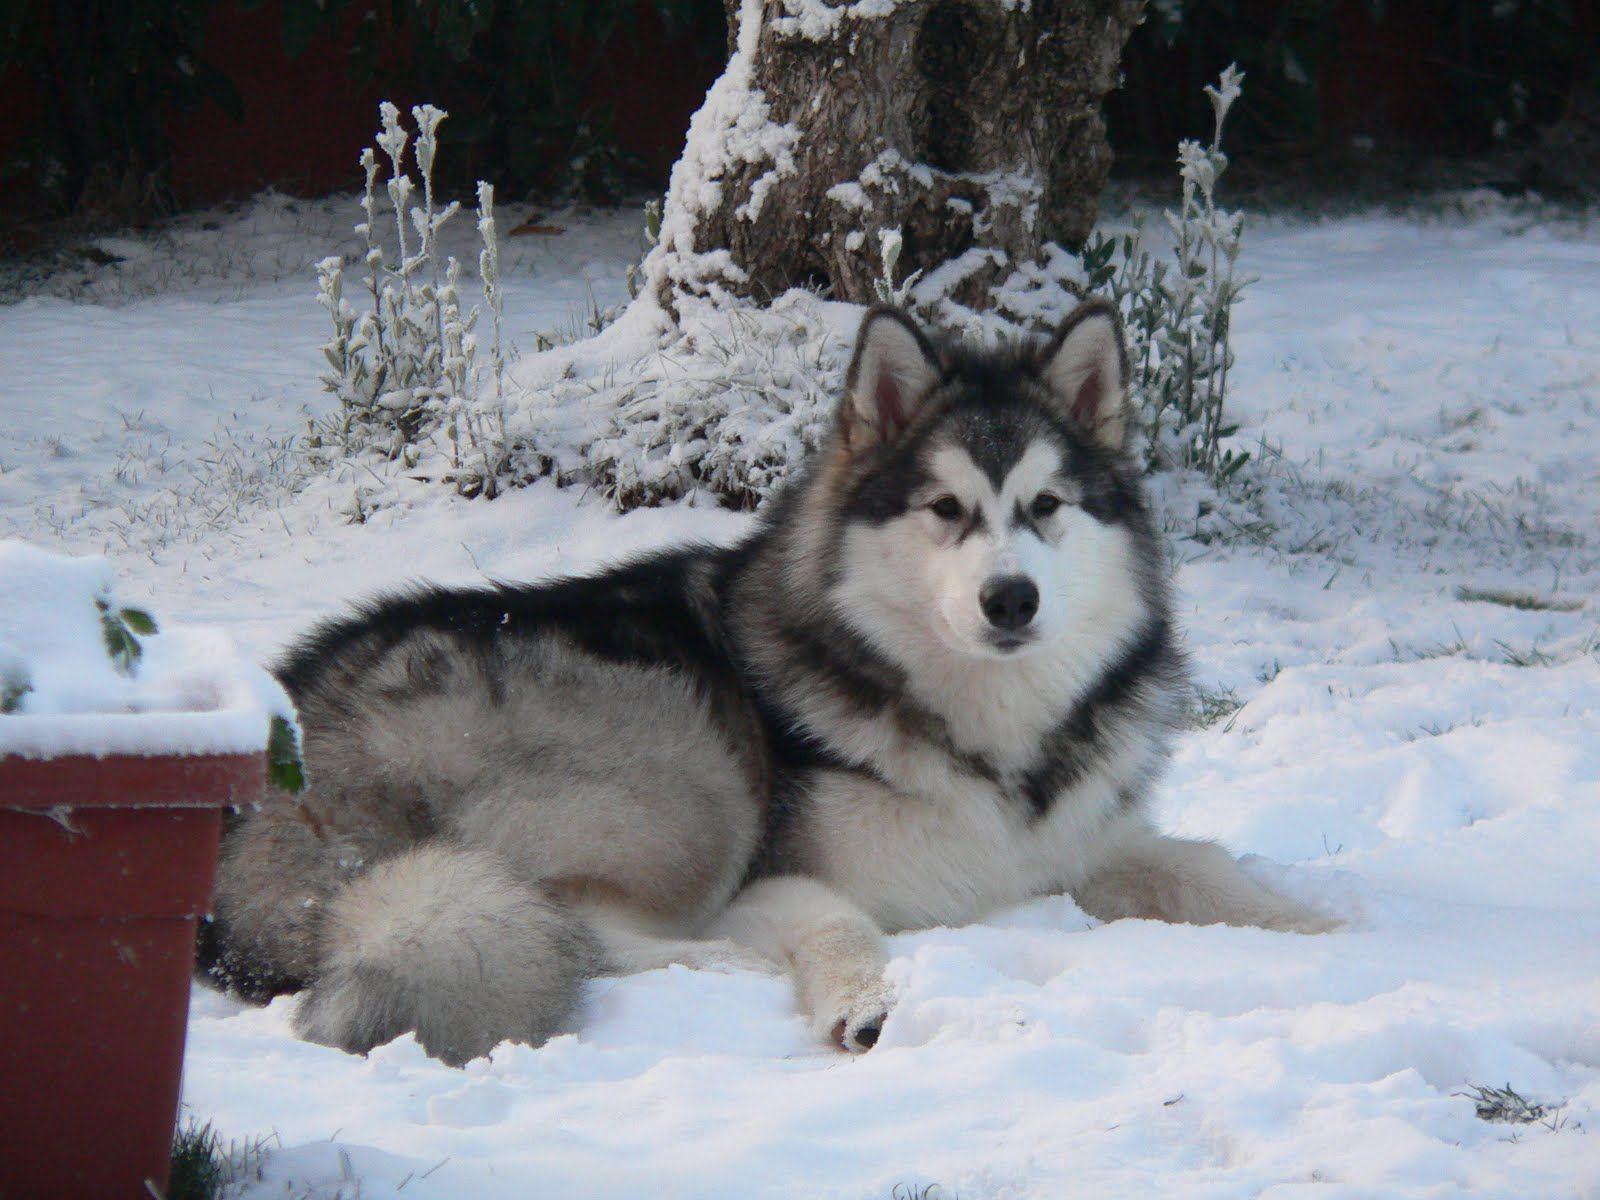 Alaskan Malamute Dog Photo Alaskan Malamute In The Winter Forest